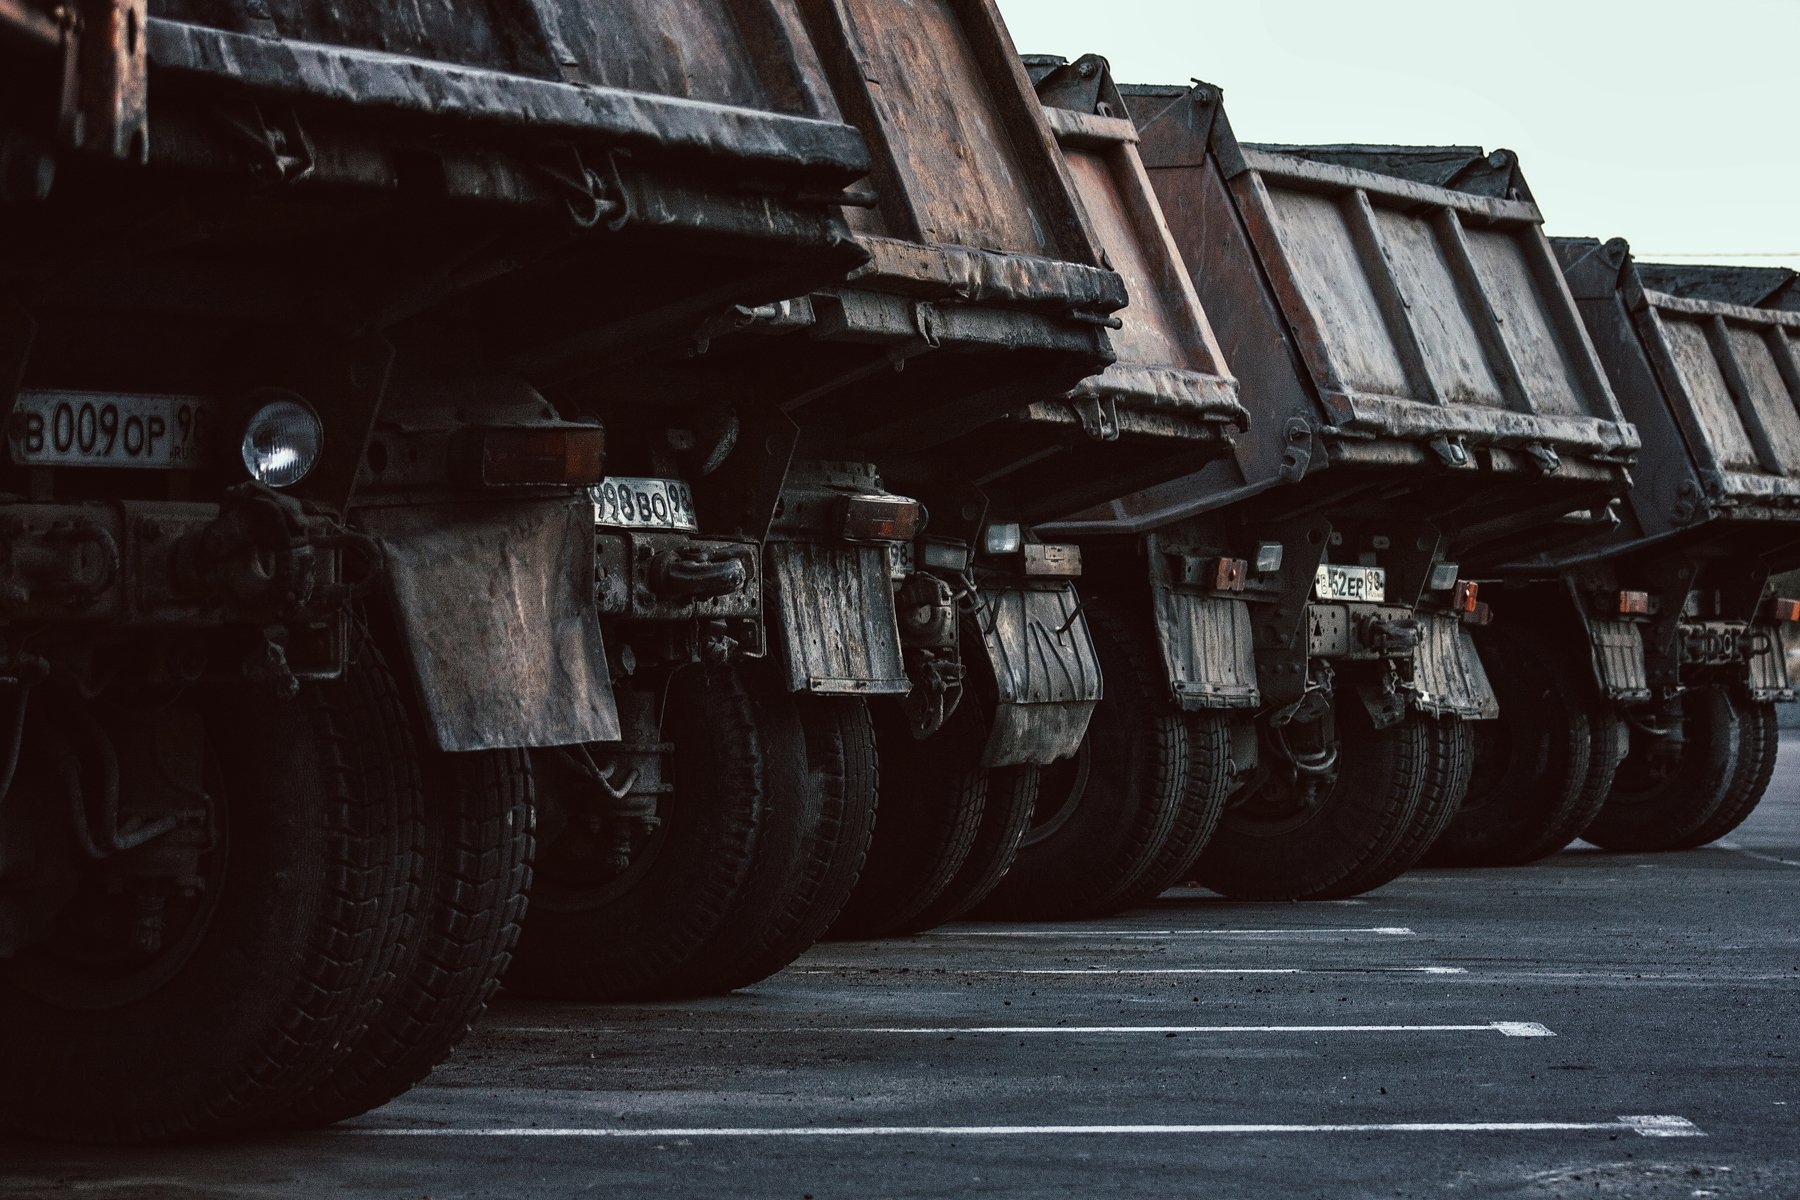 грузовик, камаз, камазы, машина, машины, работяги, Vladimir Kedrov